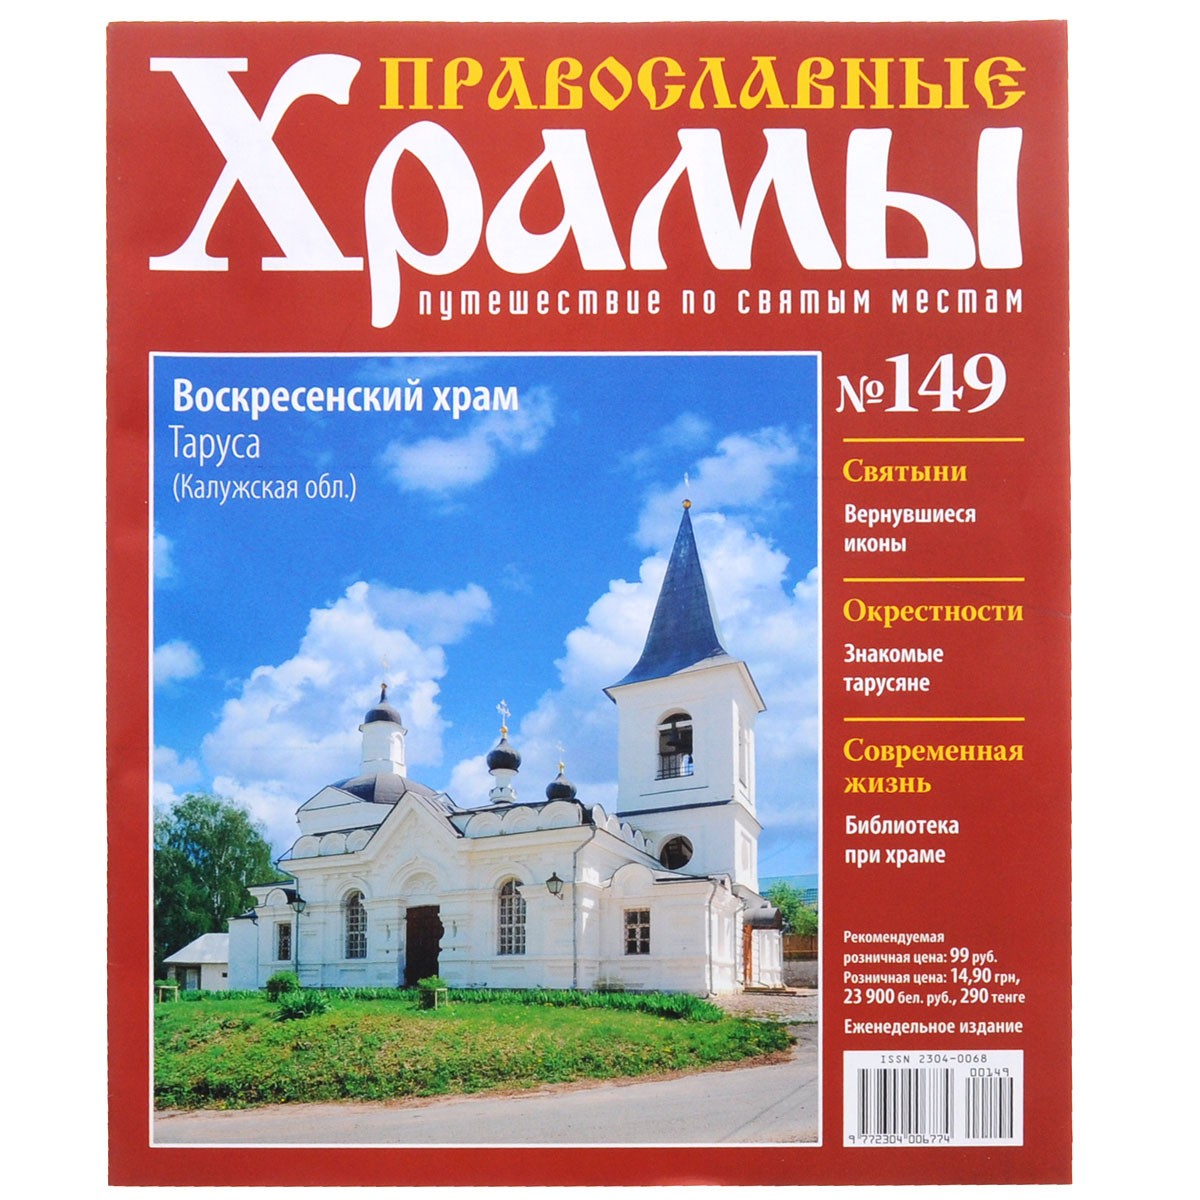 Журнал Православные храмы. Путешествие по святым местам № 149 цена